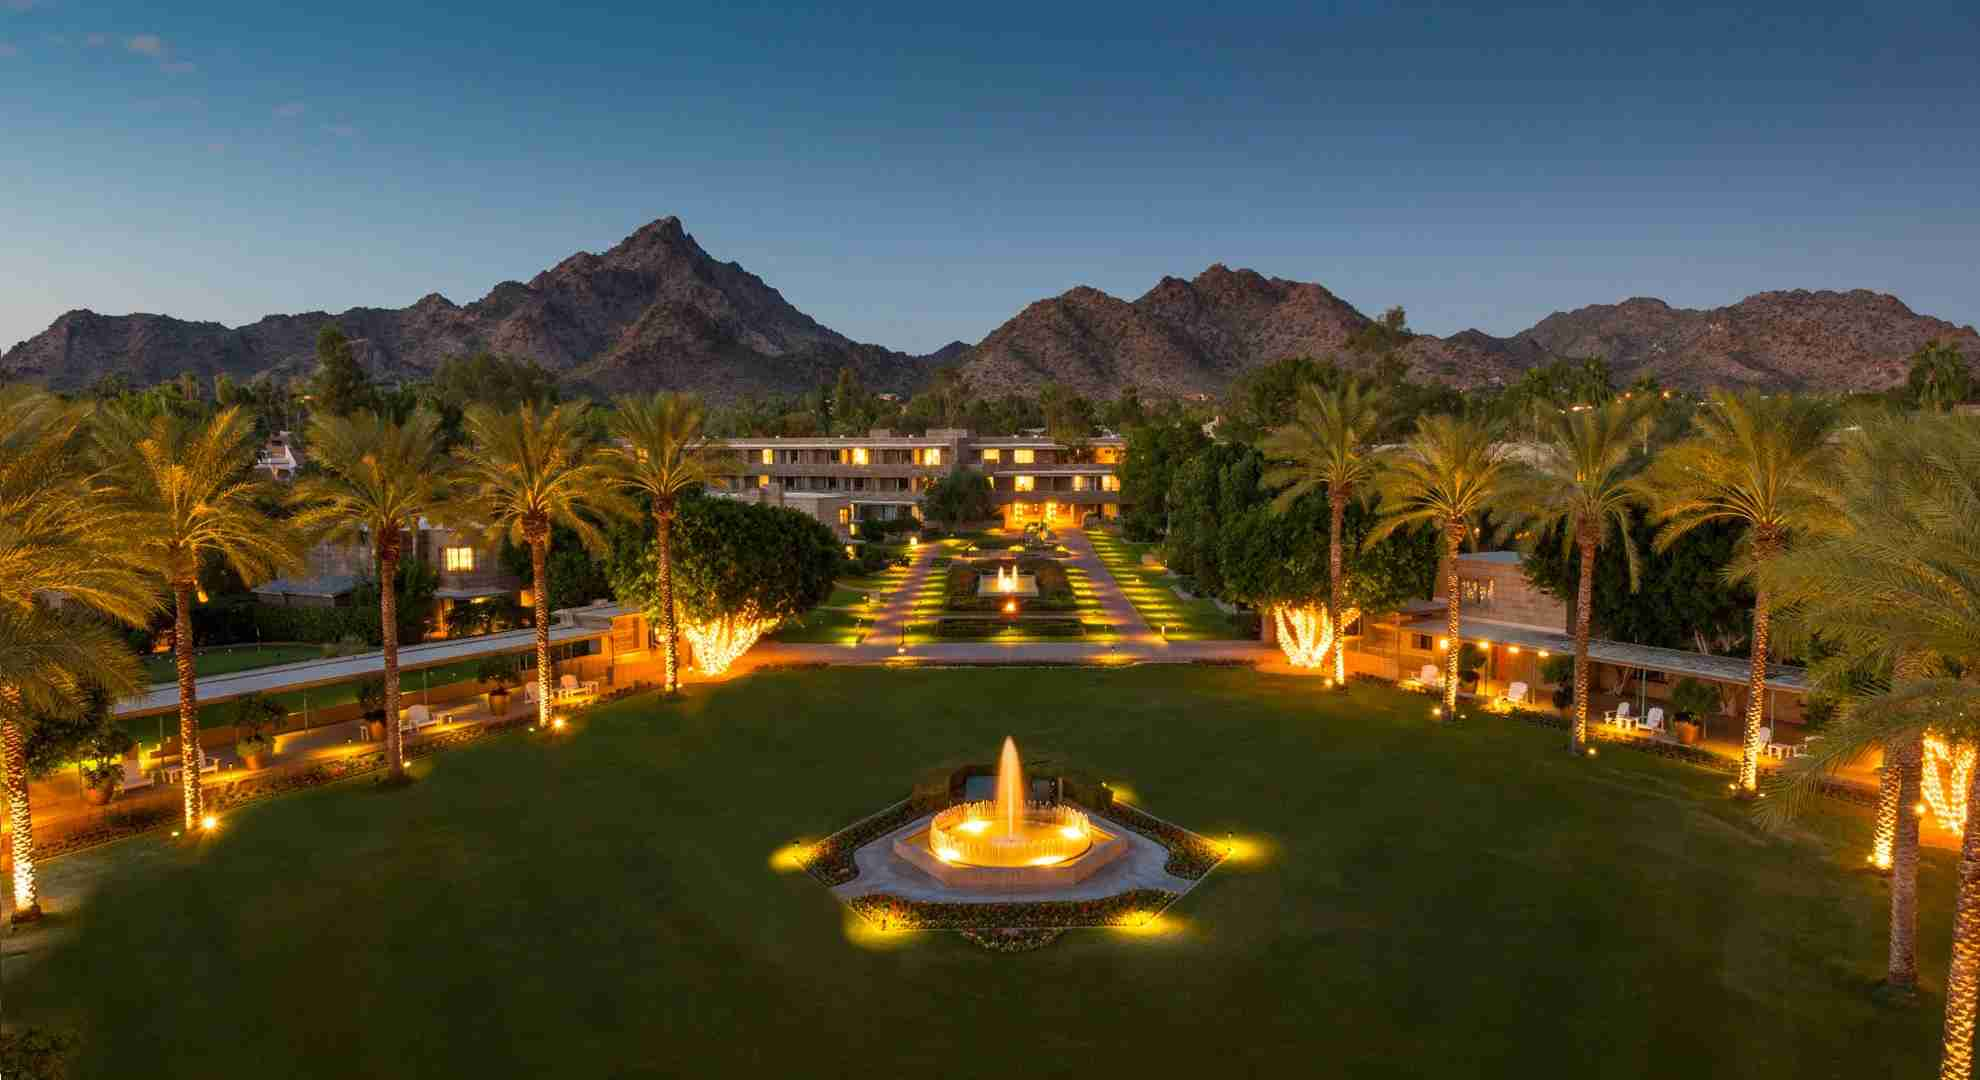 Arizona Biltmore, A Waldorf Astoria Resort (Photo courtesy of the hotel)